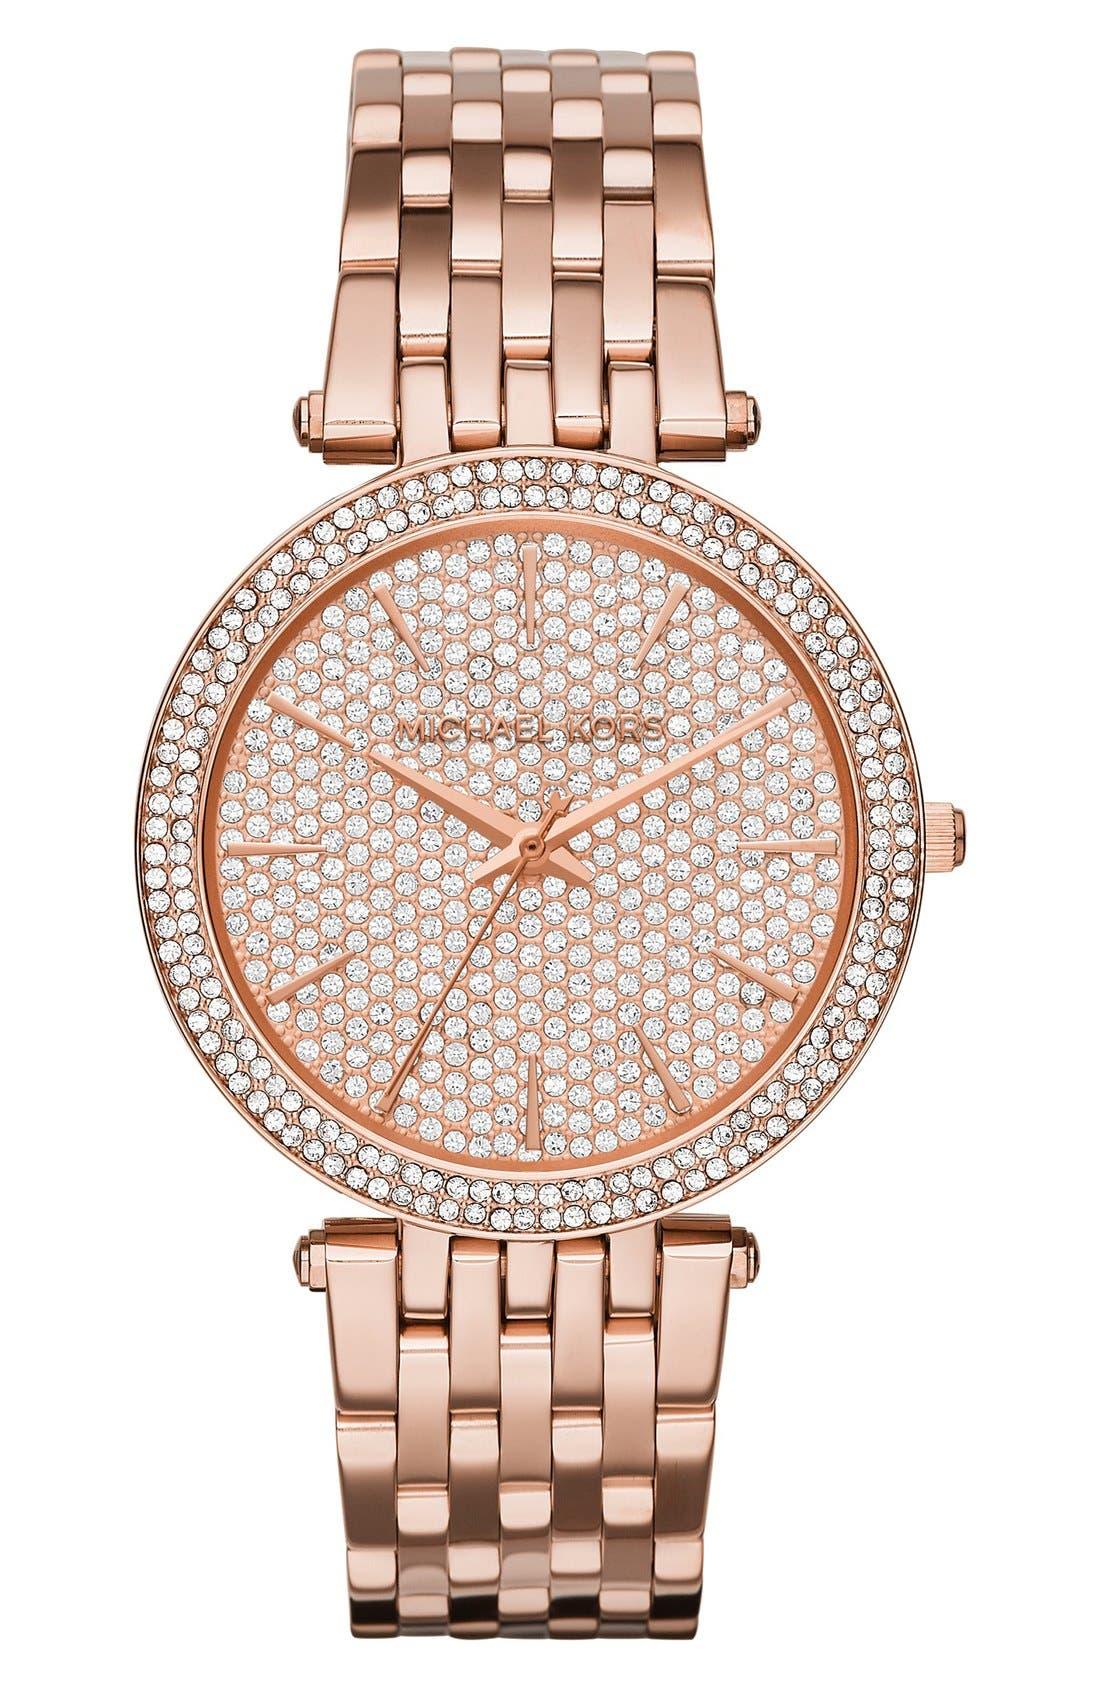 Main Image - Michael Kors'Darci' Bracelet Watch, 39mm